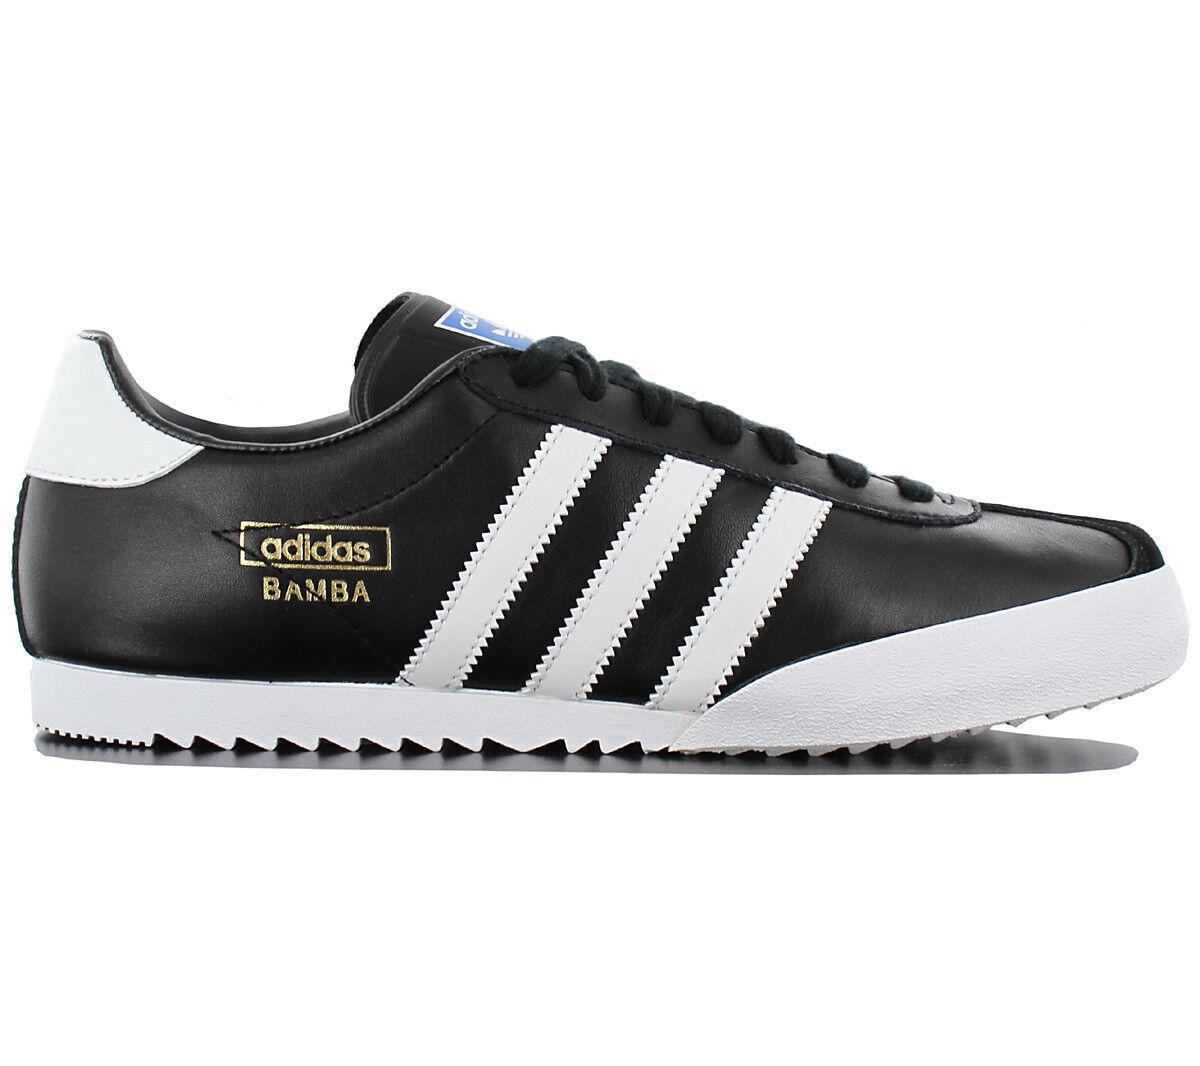 Adidas Originals Bamba Super Herren Turnschuhe Schuhe Leder Schwarz Samba D65456    | Verpackungsvielfalt